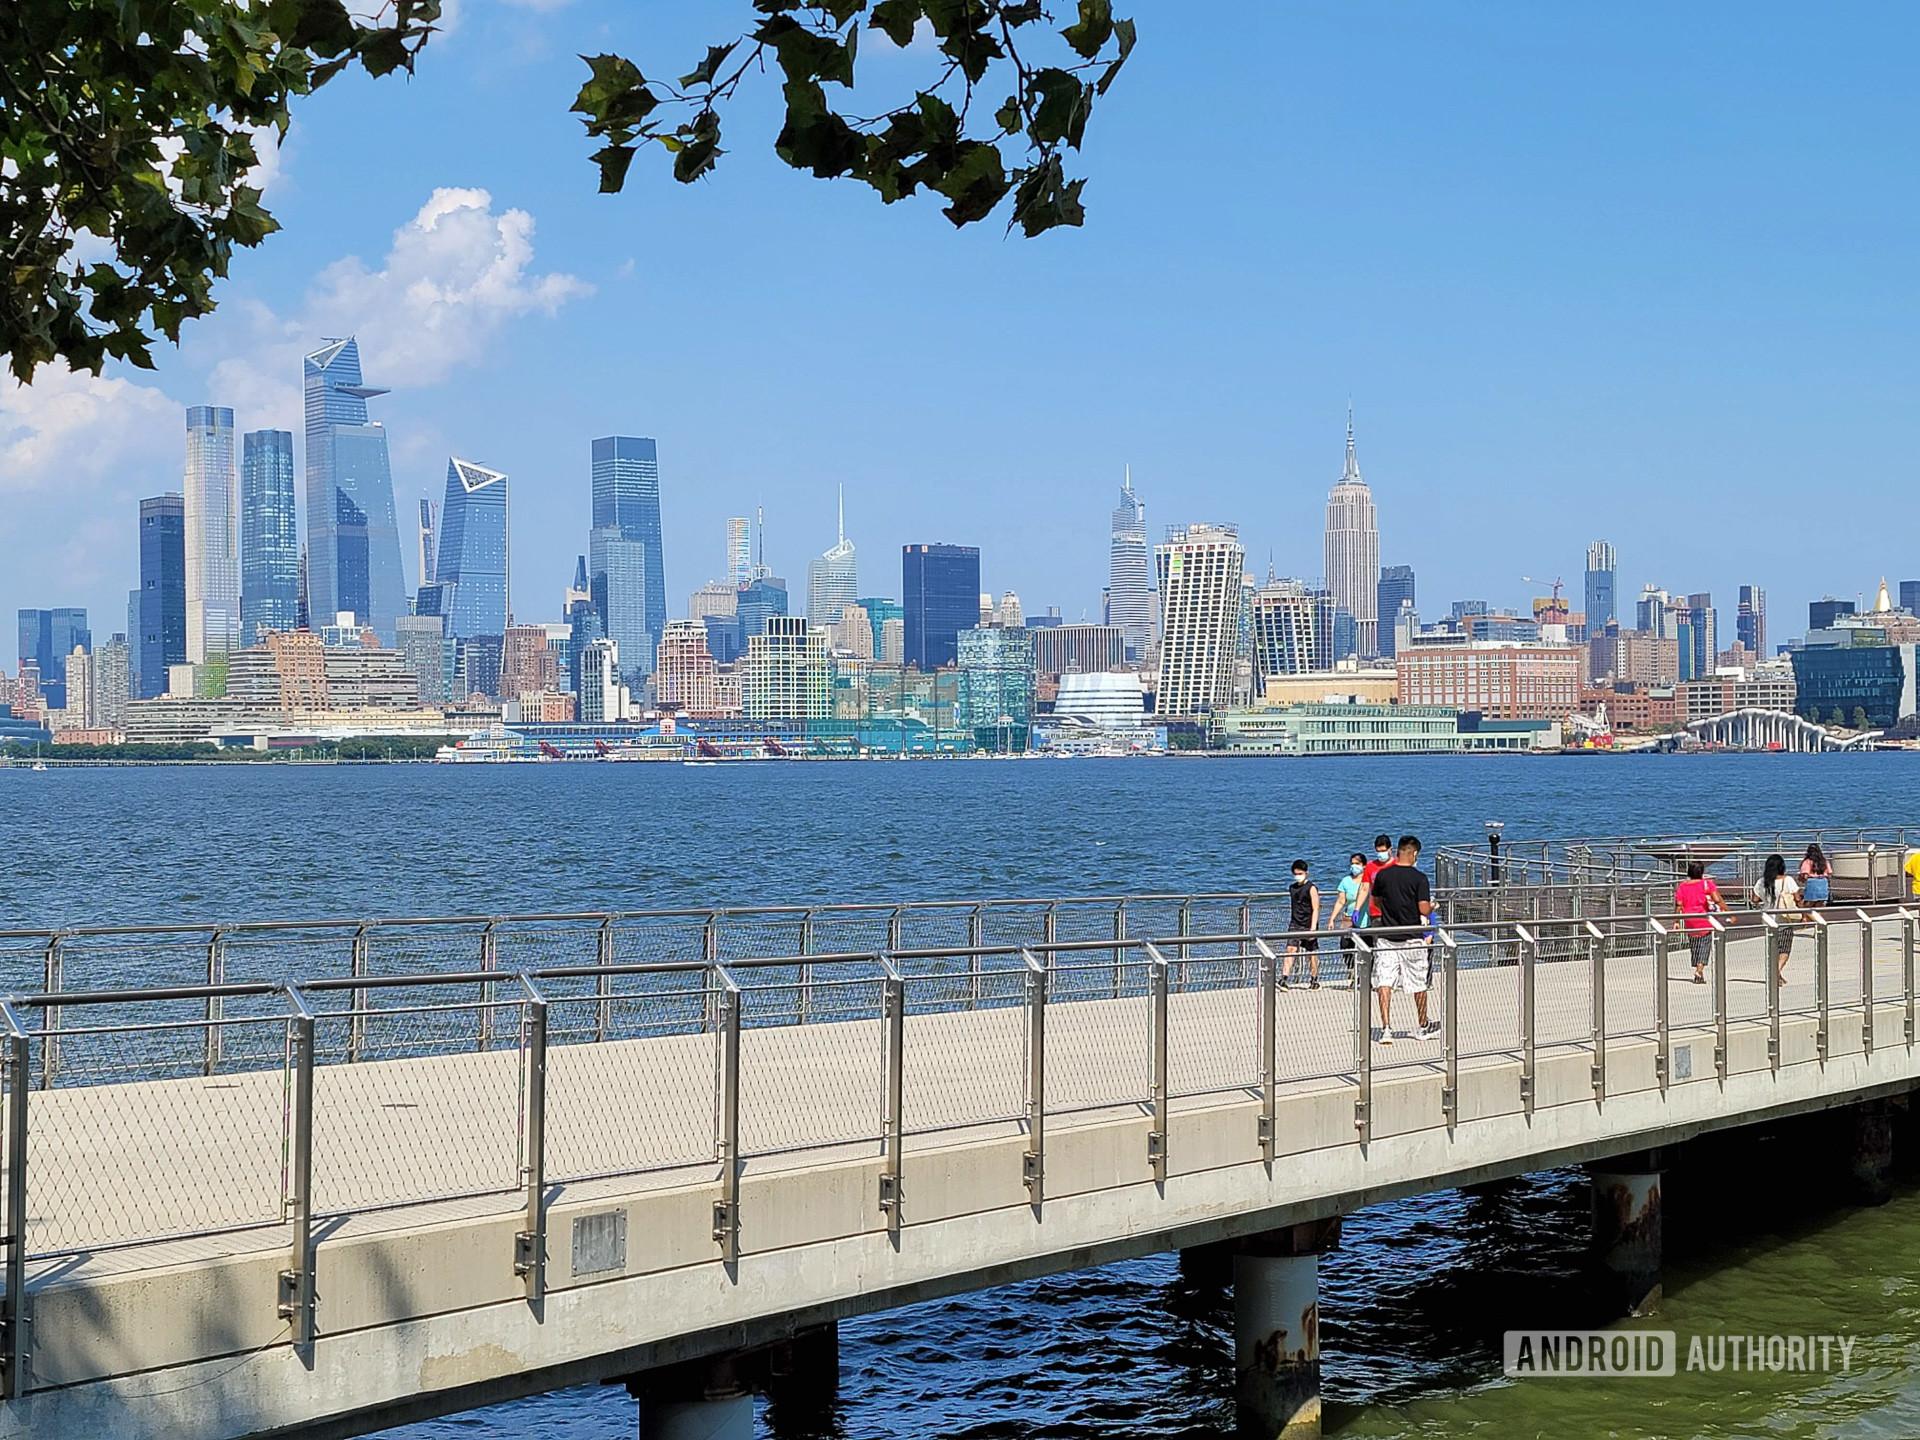 Samsung Galaxy Note 20 Ultra Photo Sample Hoboken Park 2